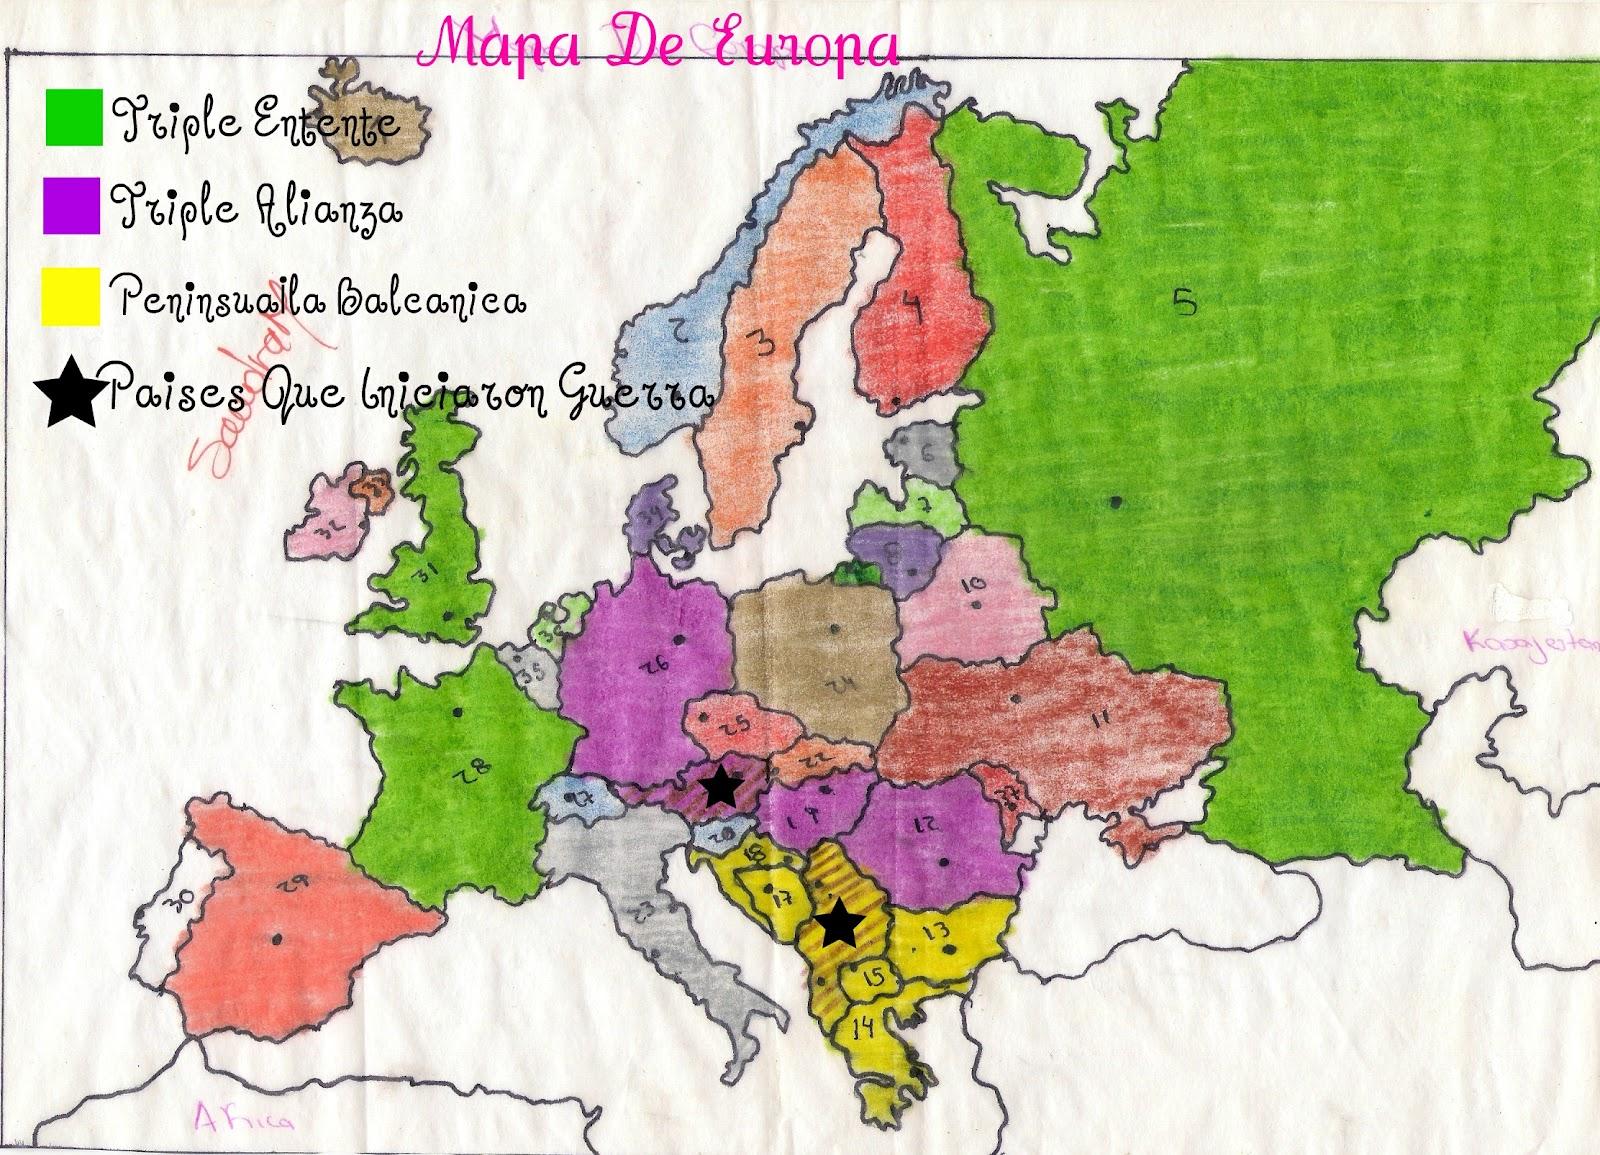 Blog Sociales Mapa De Europa Paises Enumerados Luisa Ortega 9A